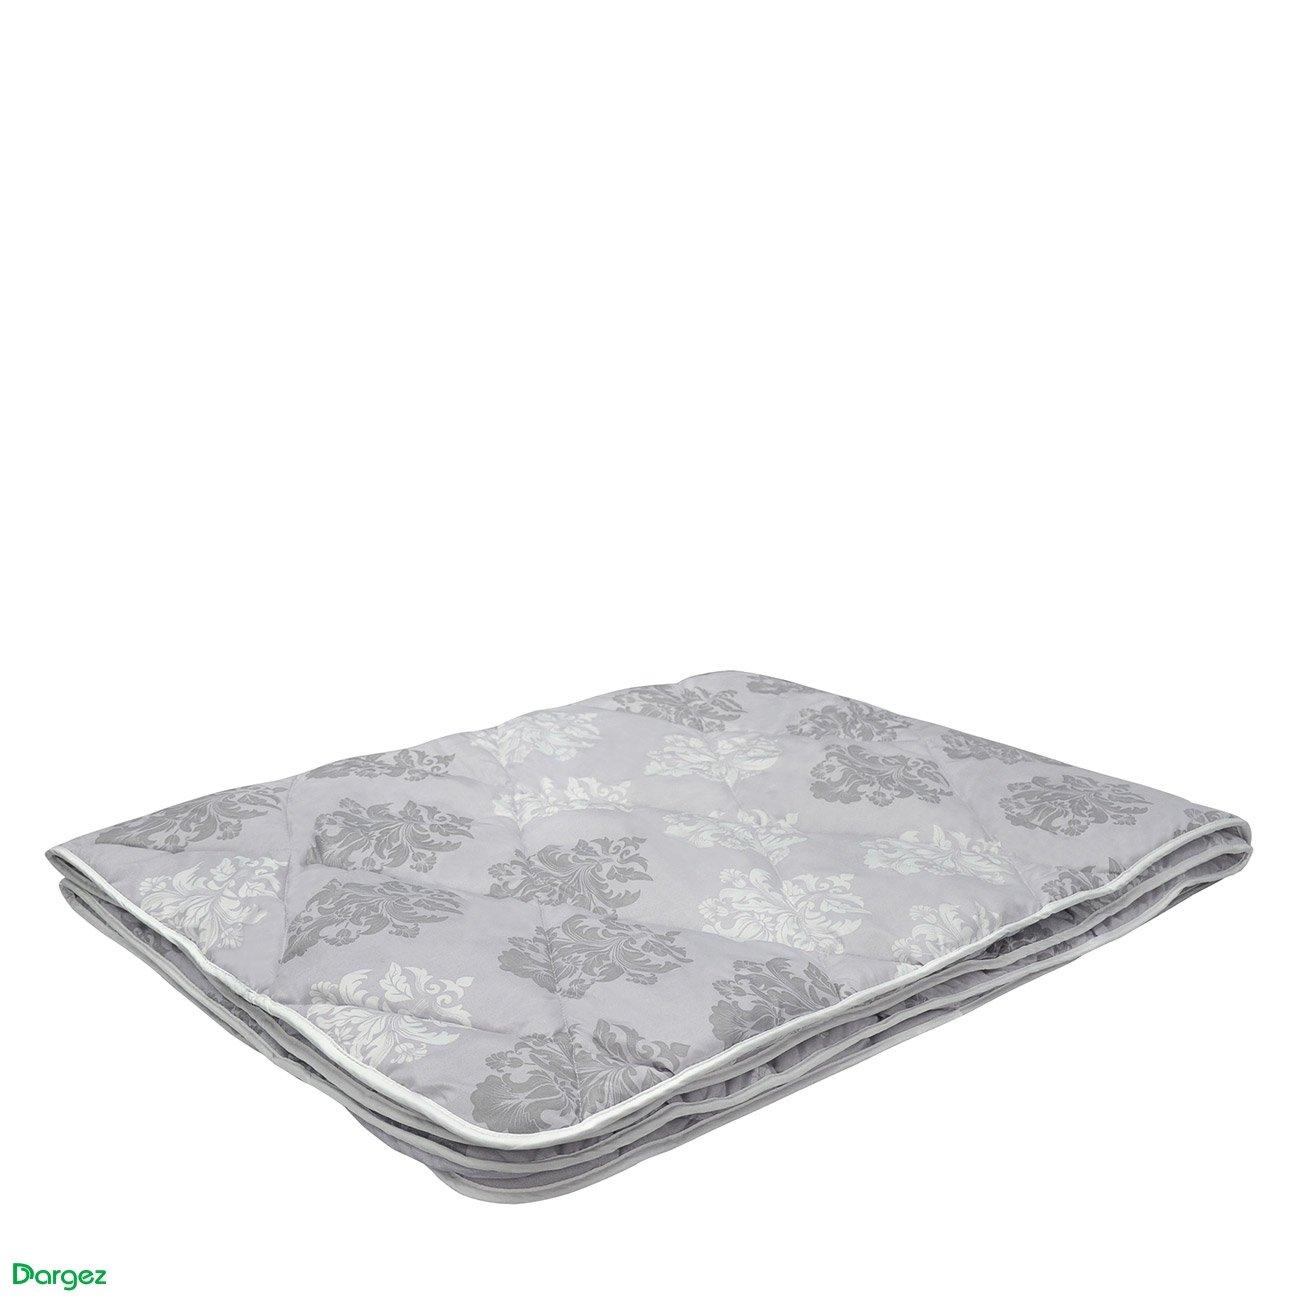 Бамбуковое одеяло Угольный бамбук Даргез